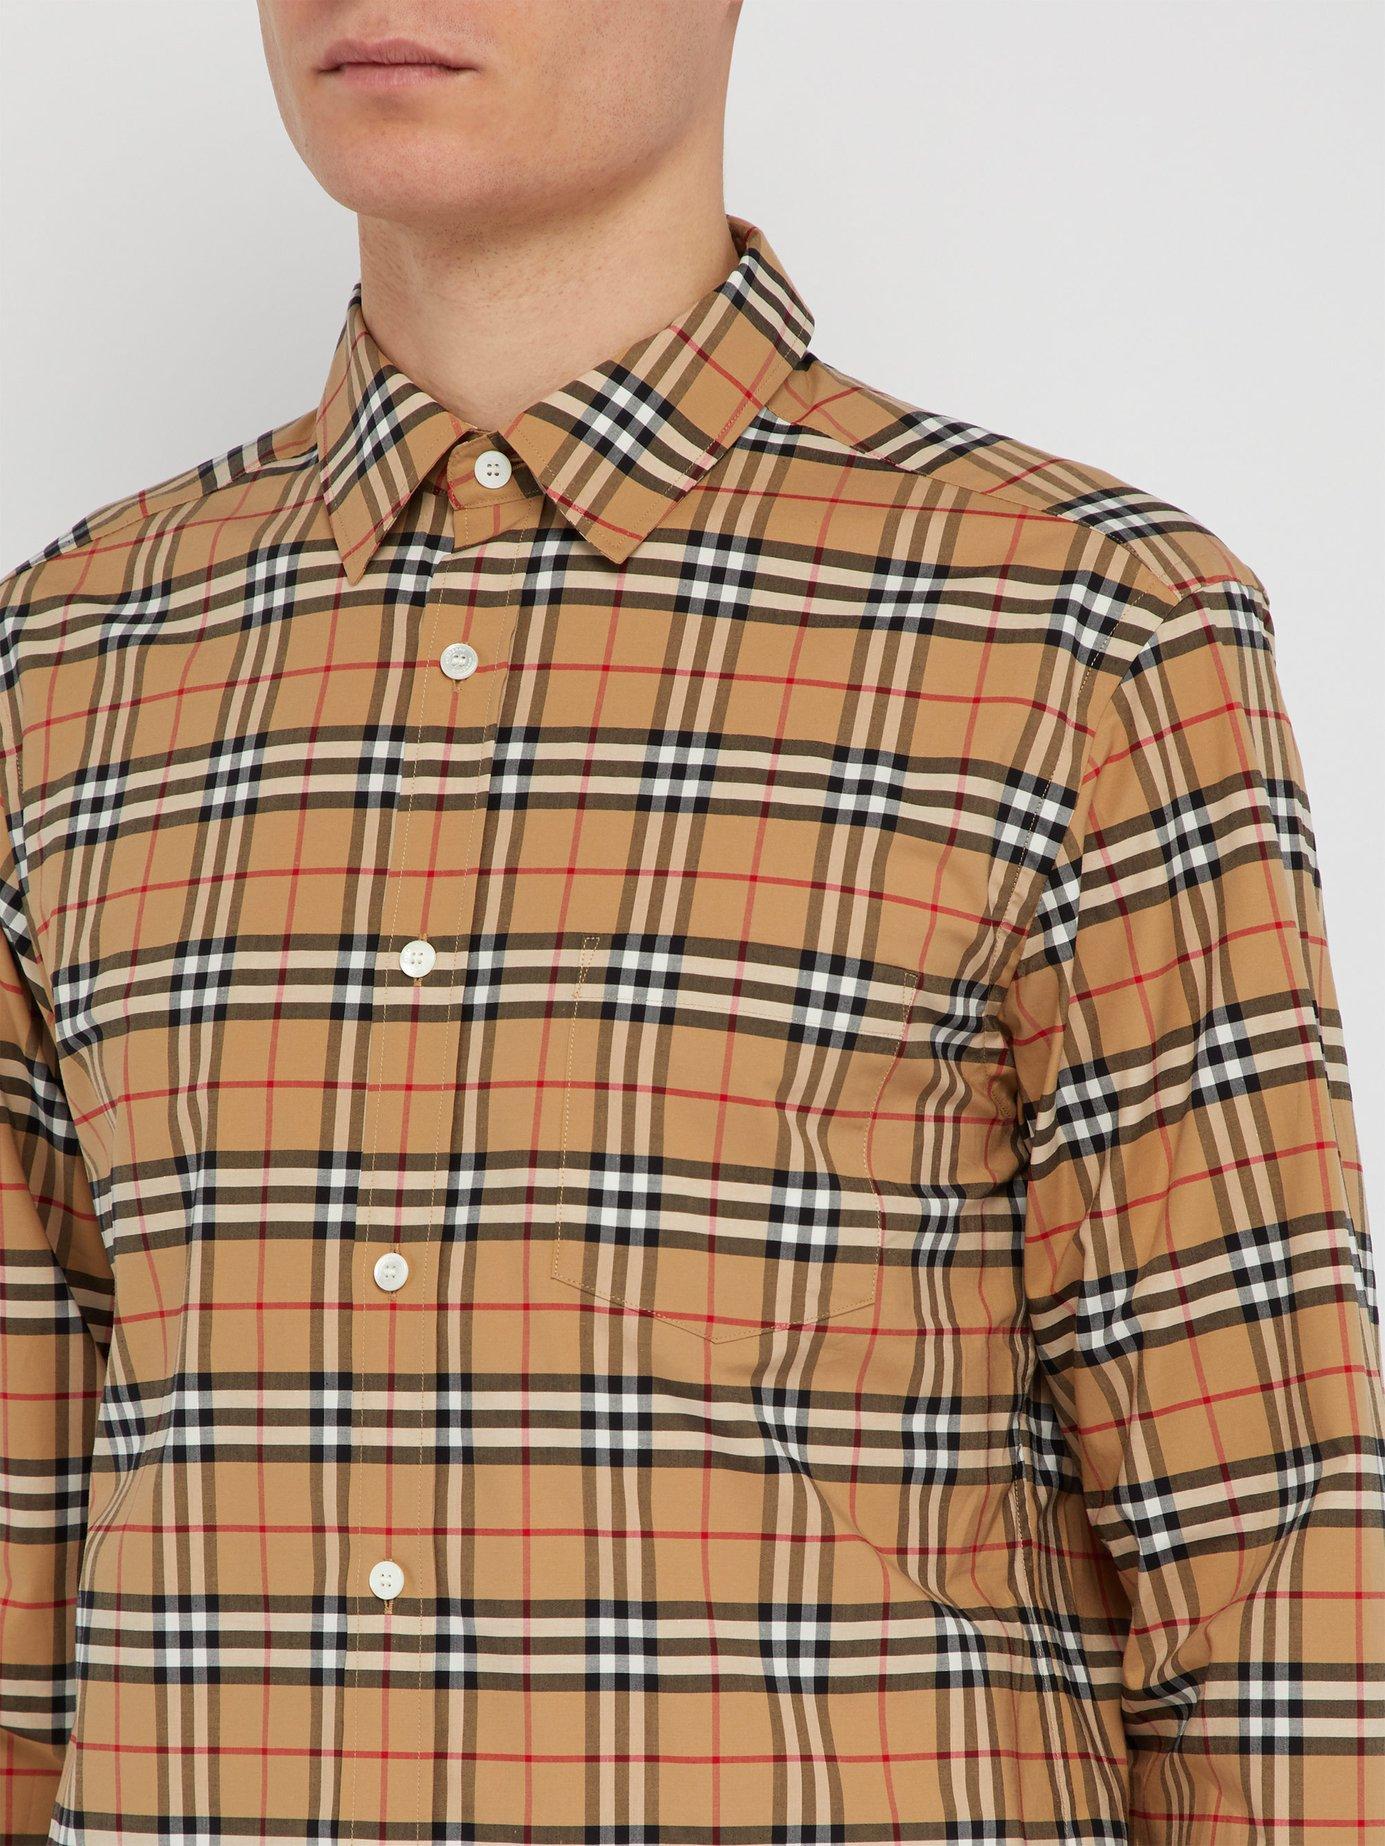 72c765b3872 Burberry - Multicolor George House Check Cotton Blend Shirt for Men - Lyst.  View fullscreen